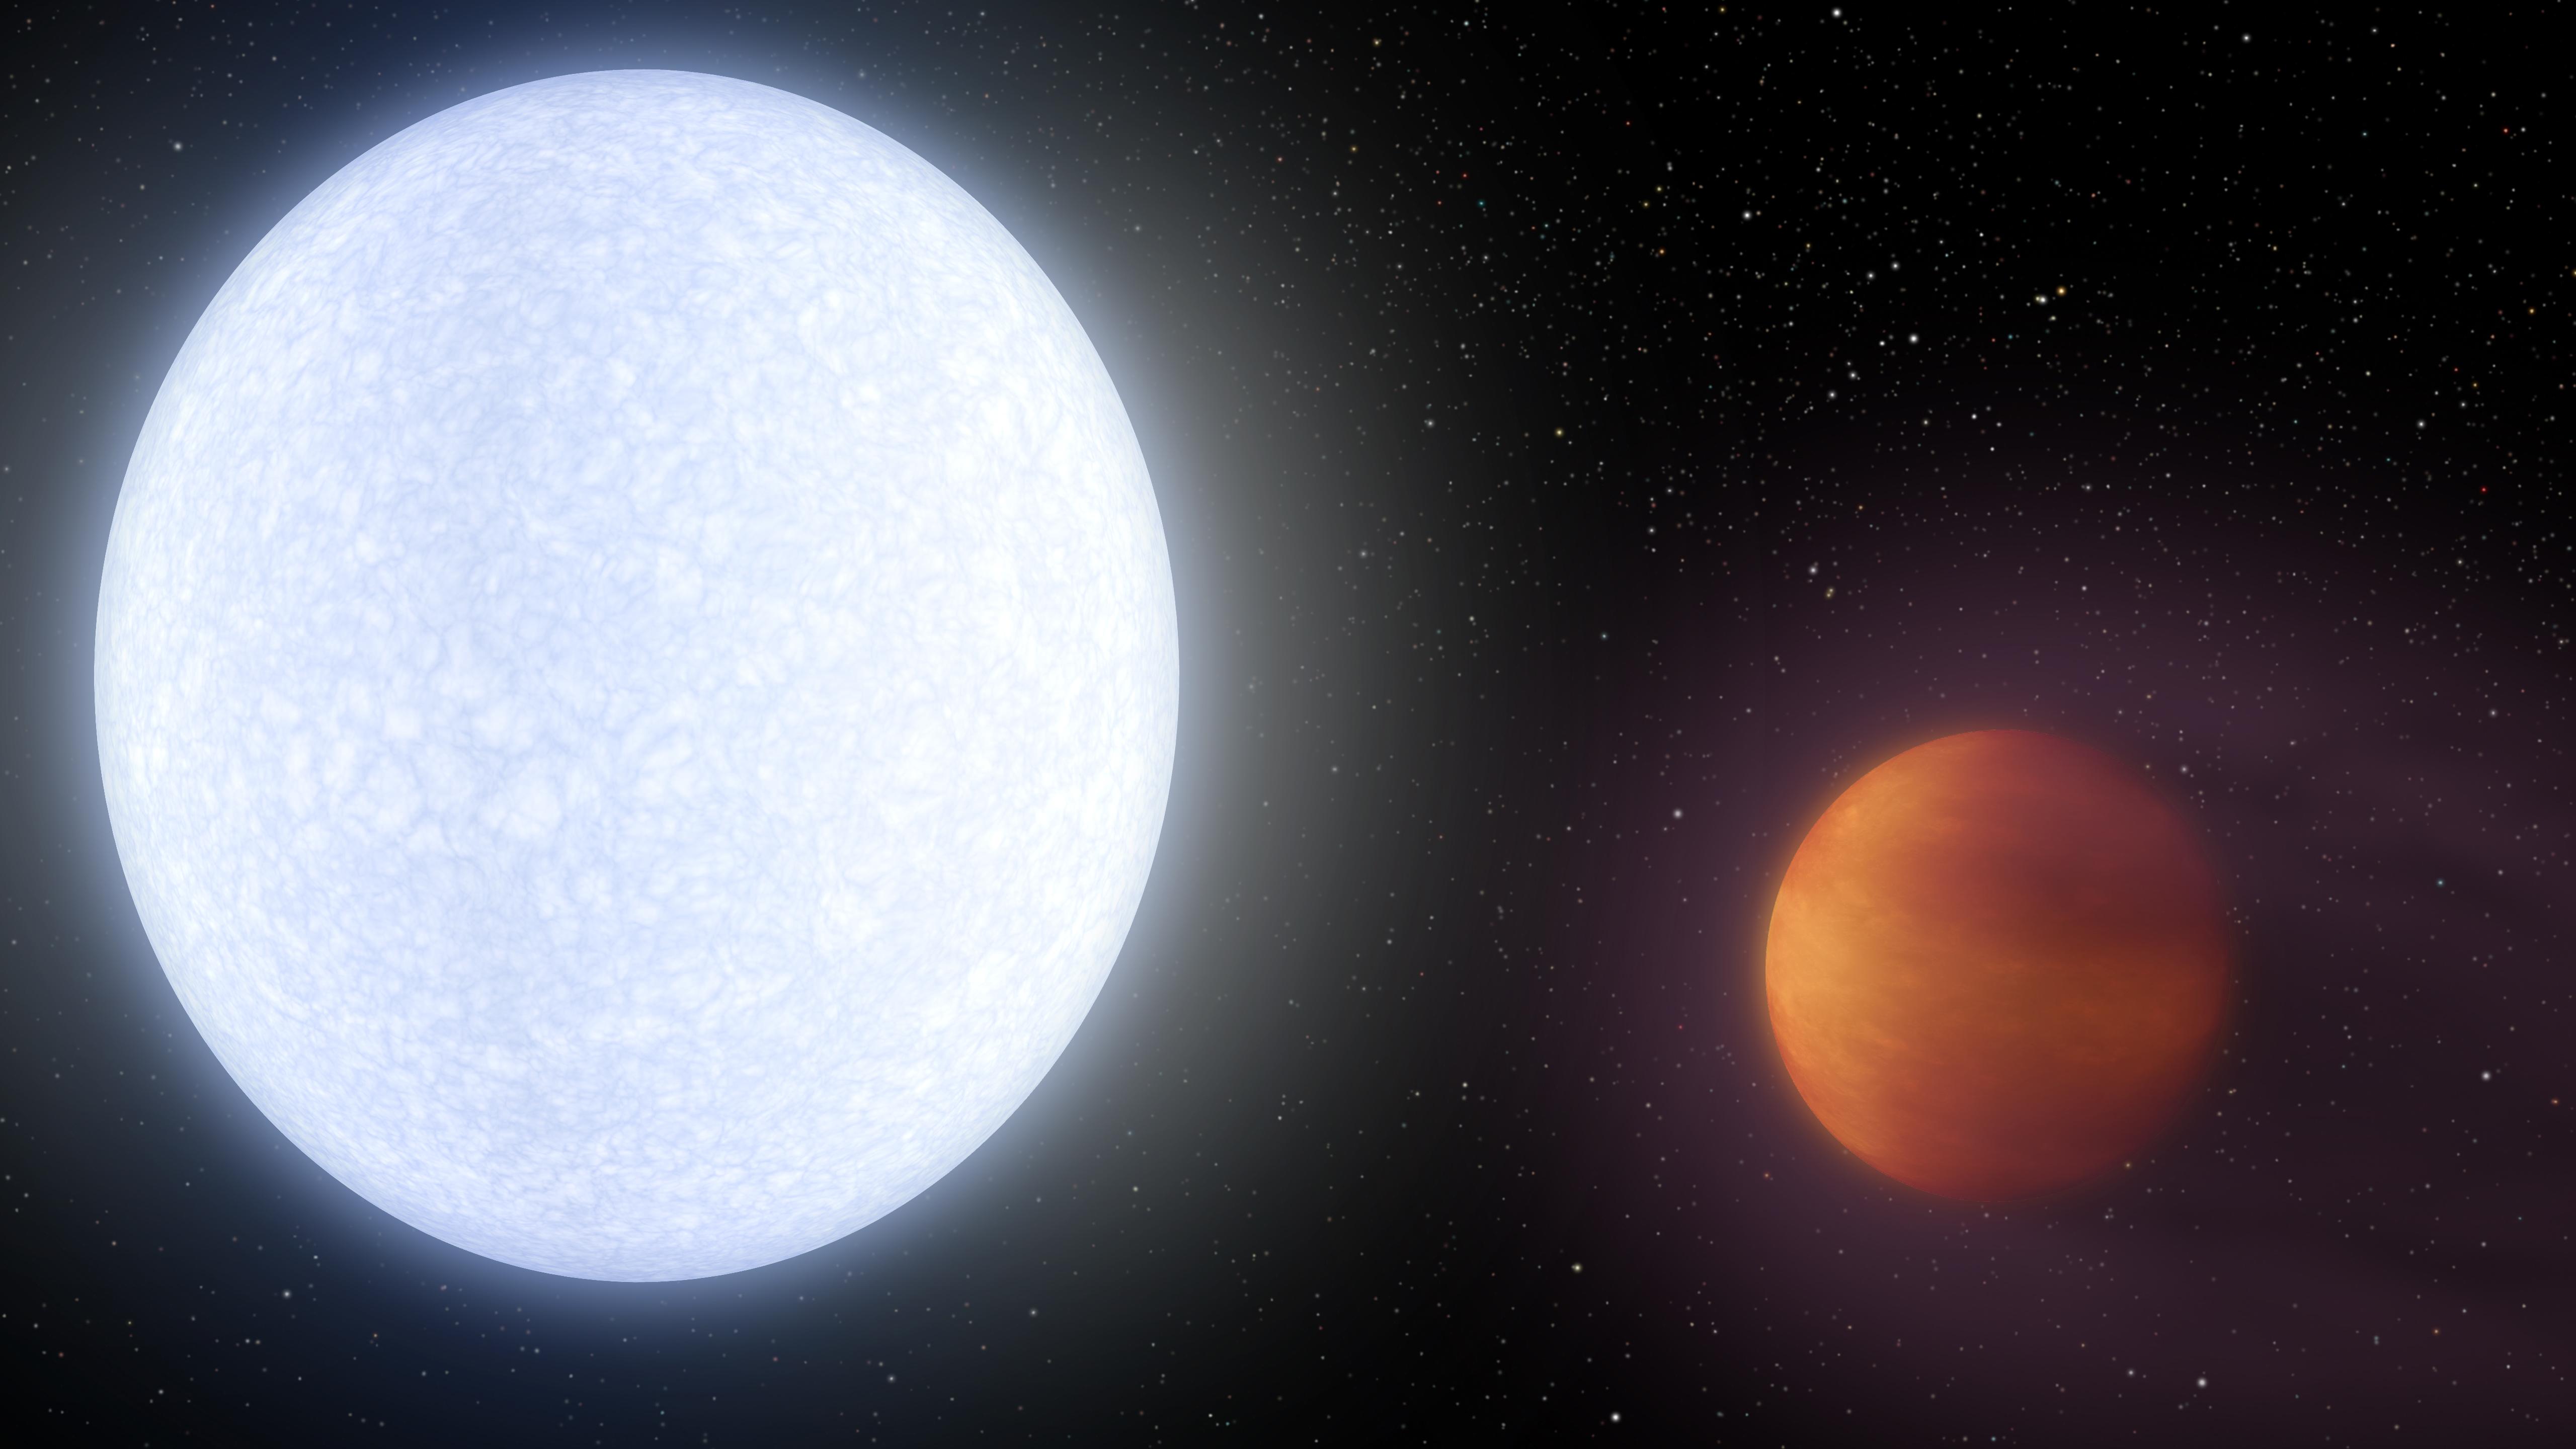 Звезда KELT-9 ипланета KELT-9b.